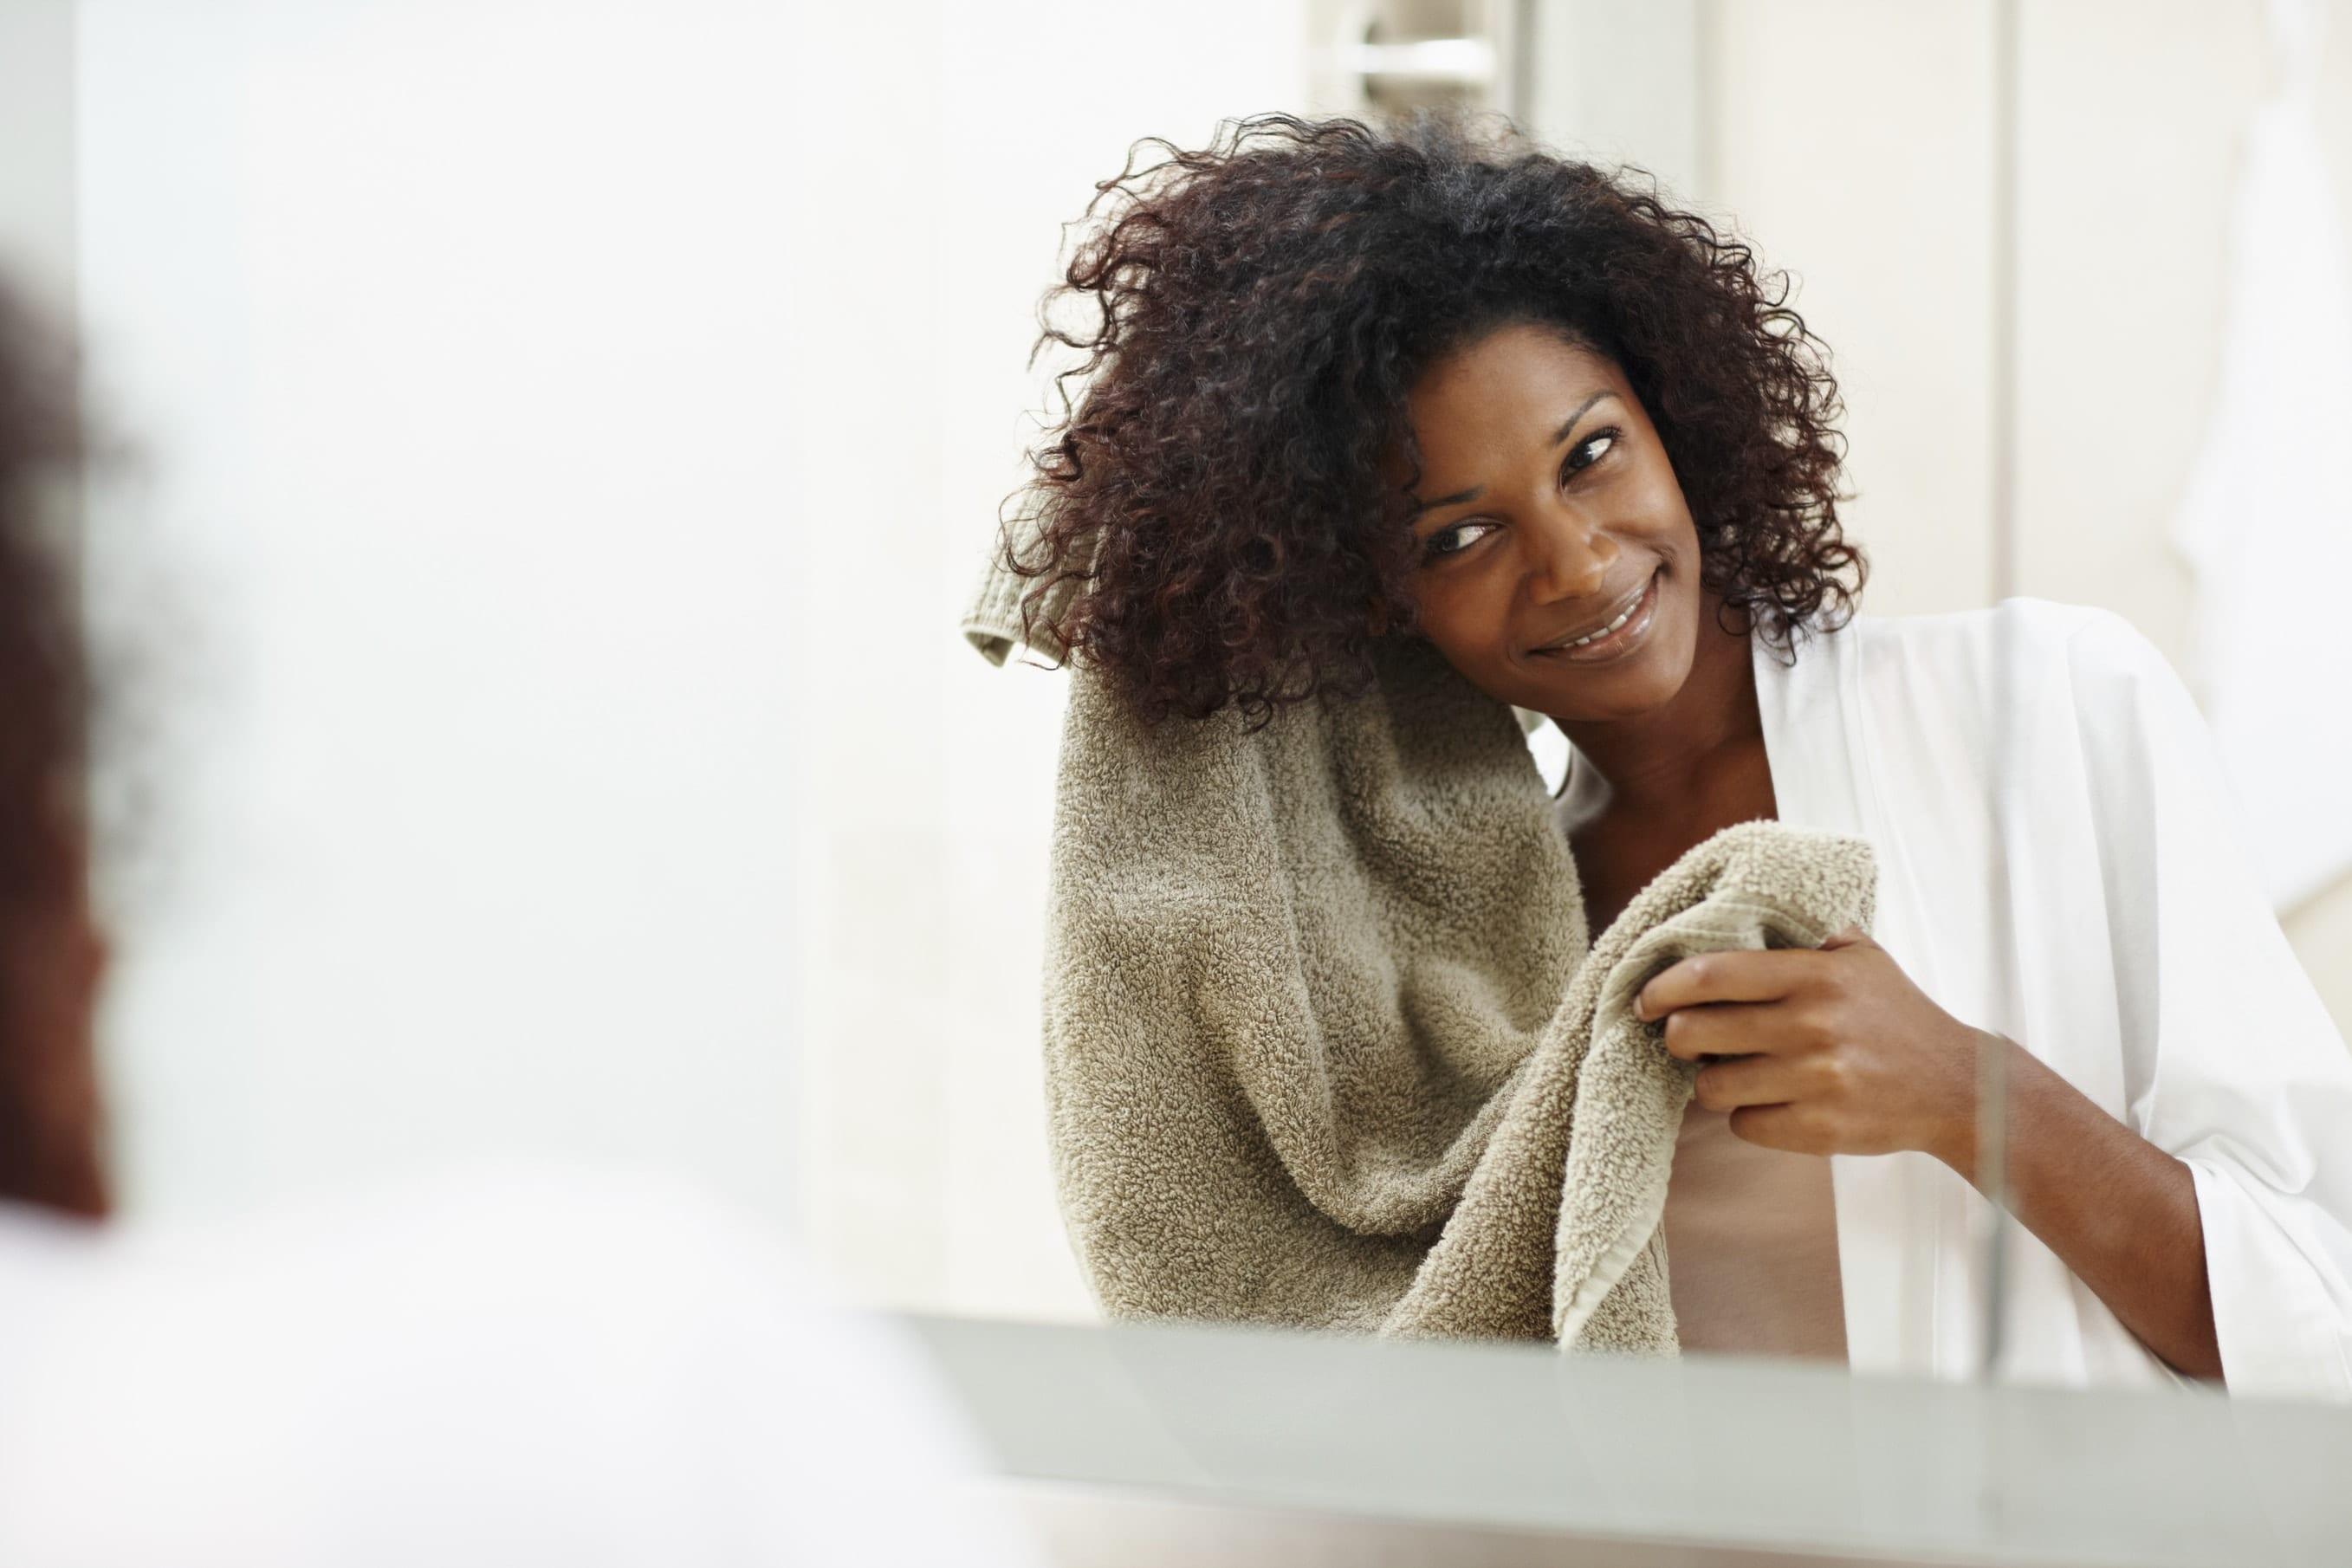 Tresemme Naturals: All Things Hair - IMAGE - black girl washing hair